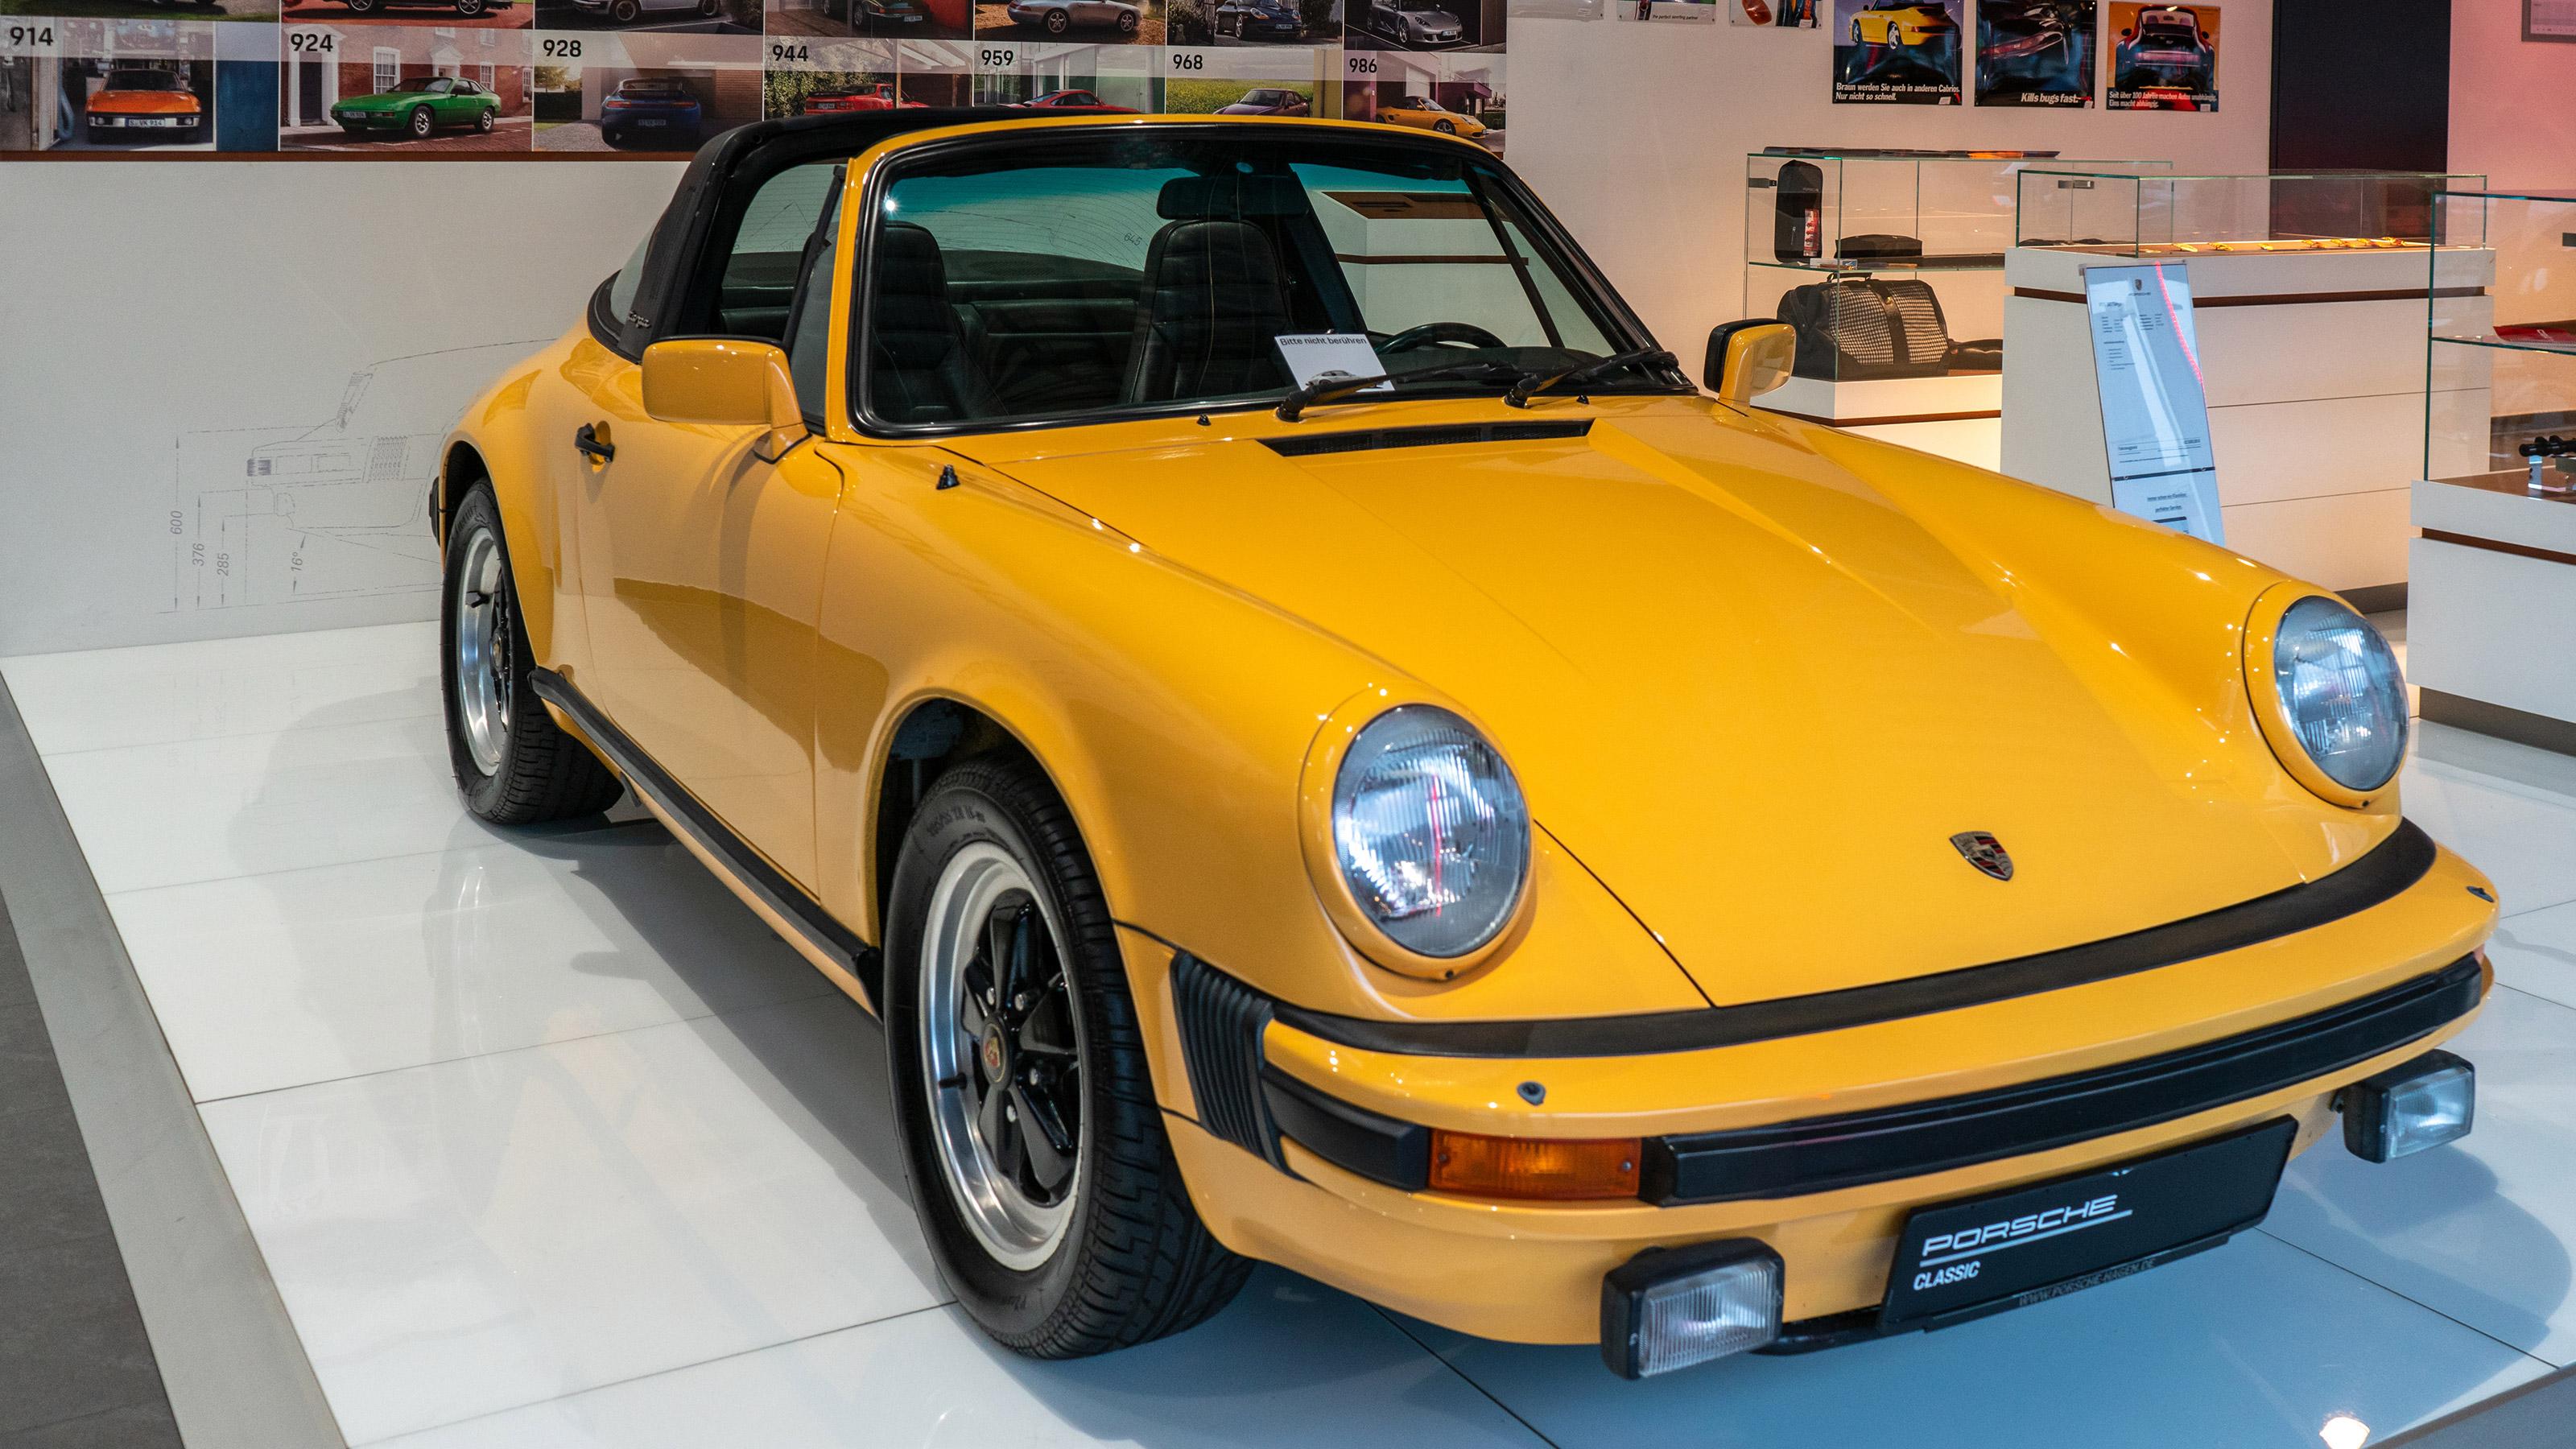 Porsche - Порше Центр Леннеталь